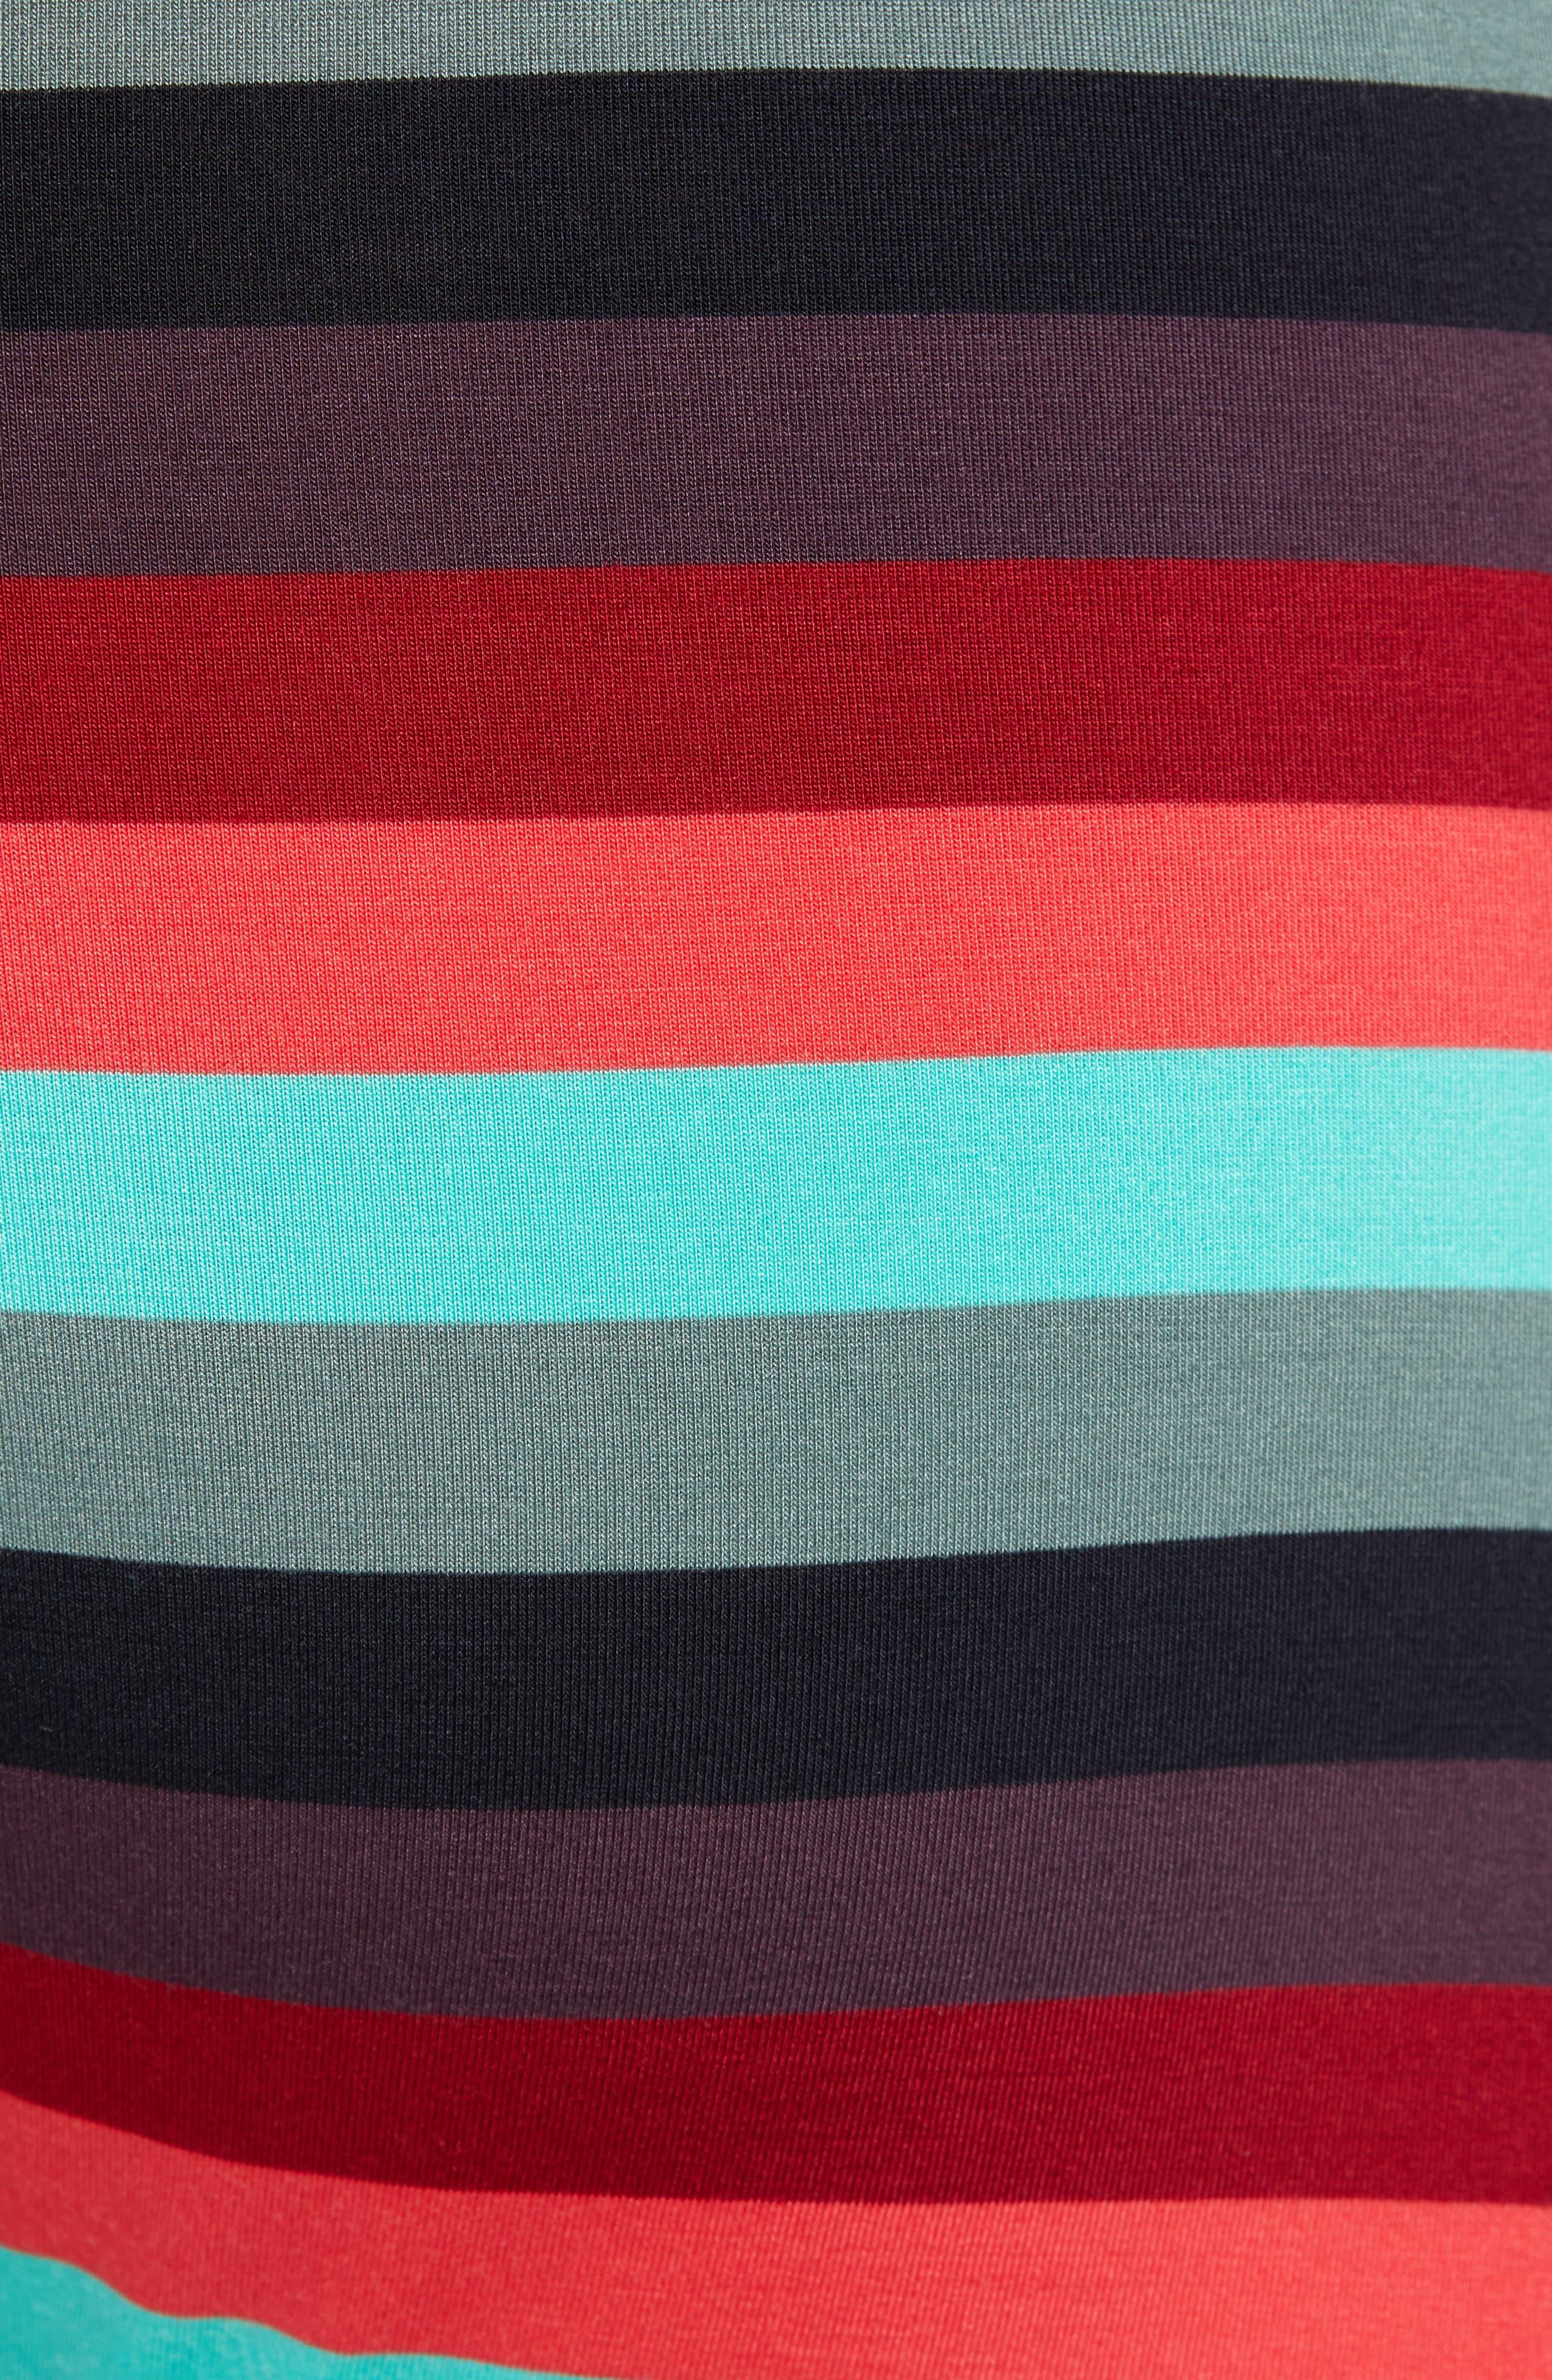 Ultra Cabana Stripe Stretch Boxer Briefs,                             Alternate thumbnail 5, color,                             BERRY CABANA STRIPE